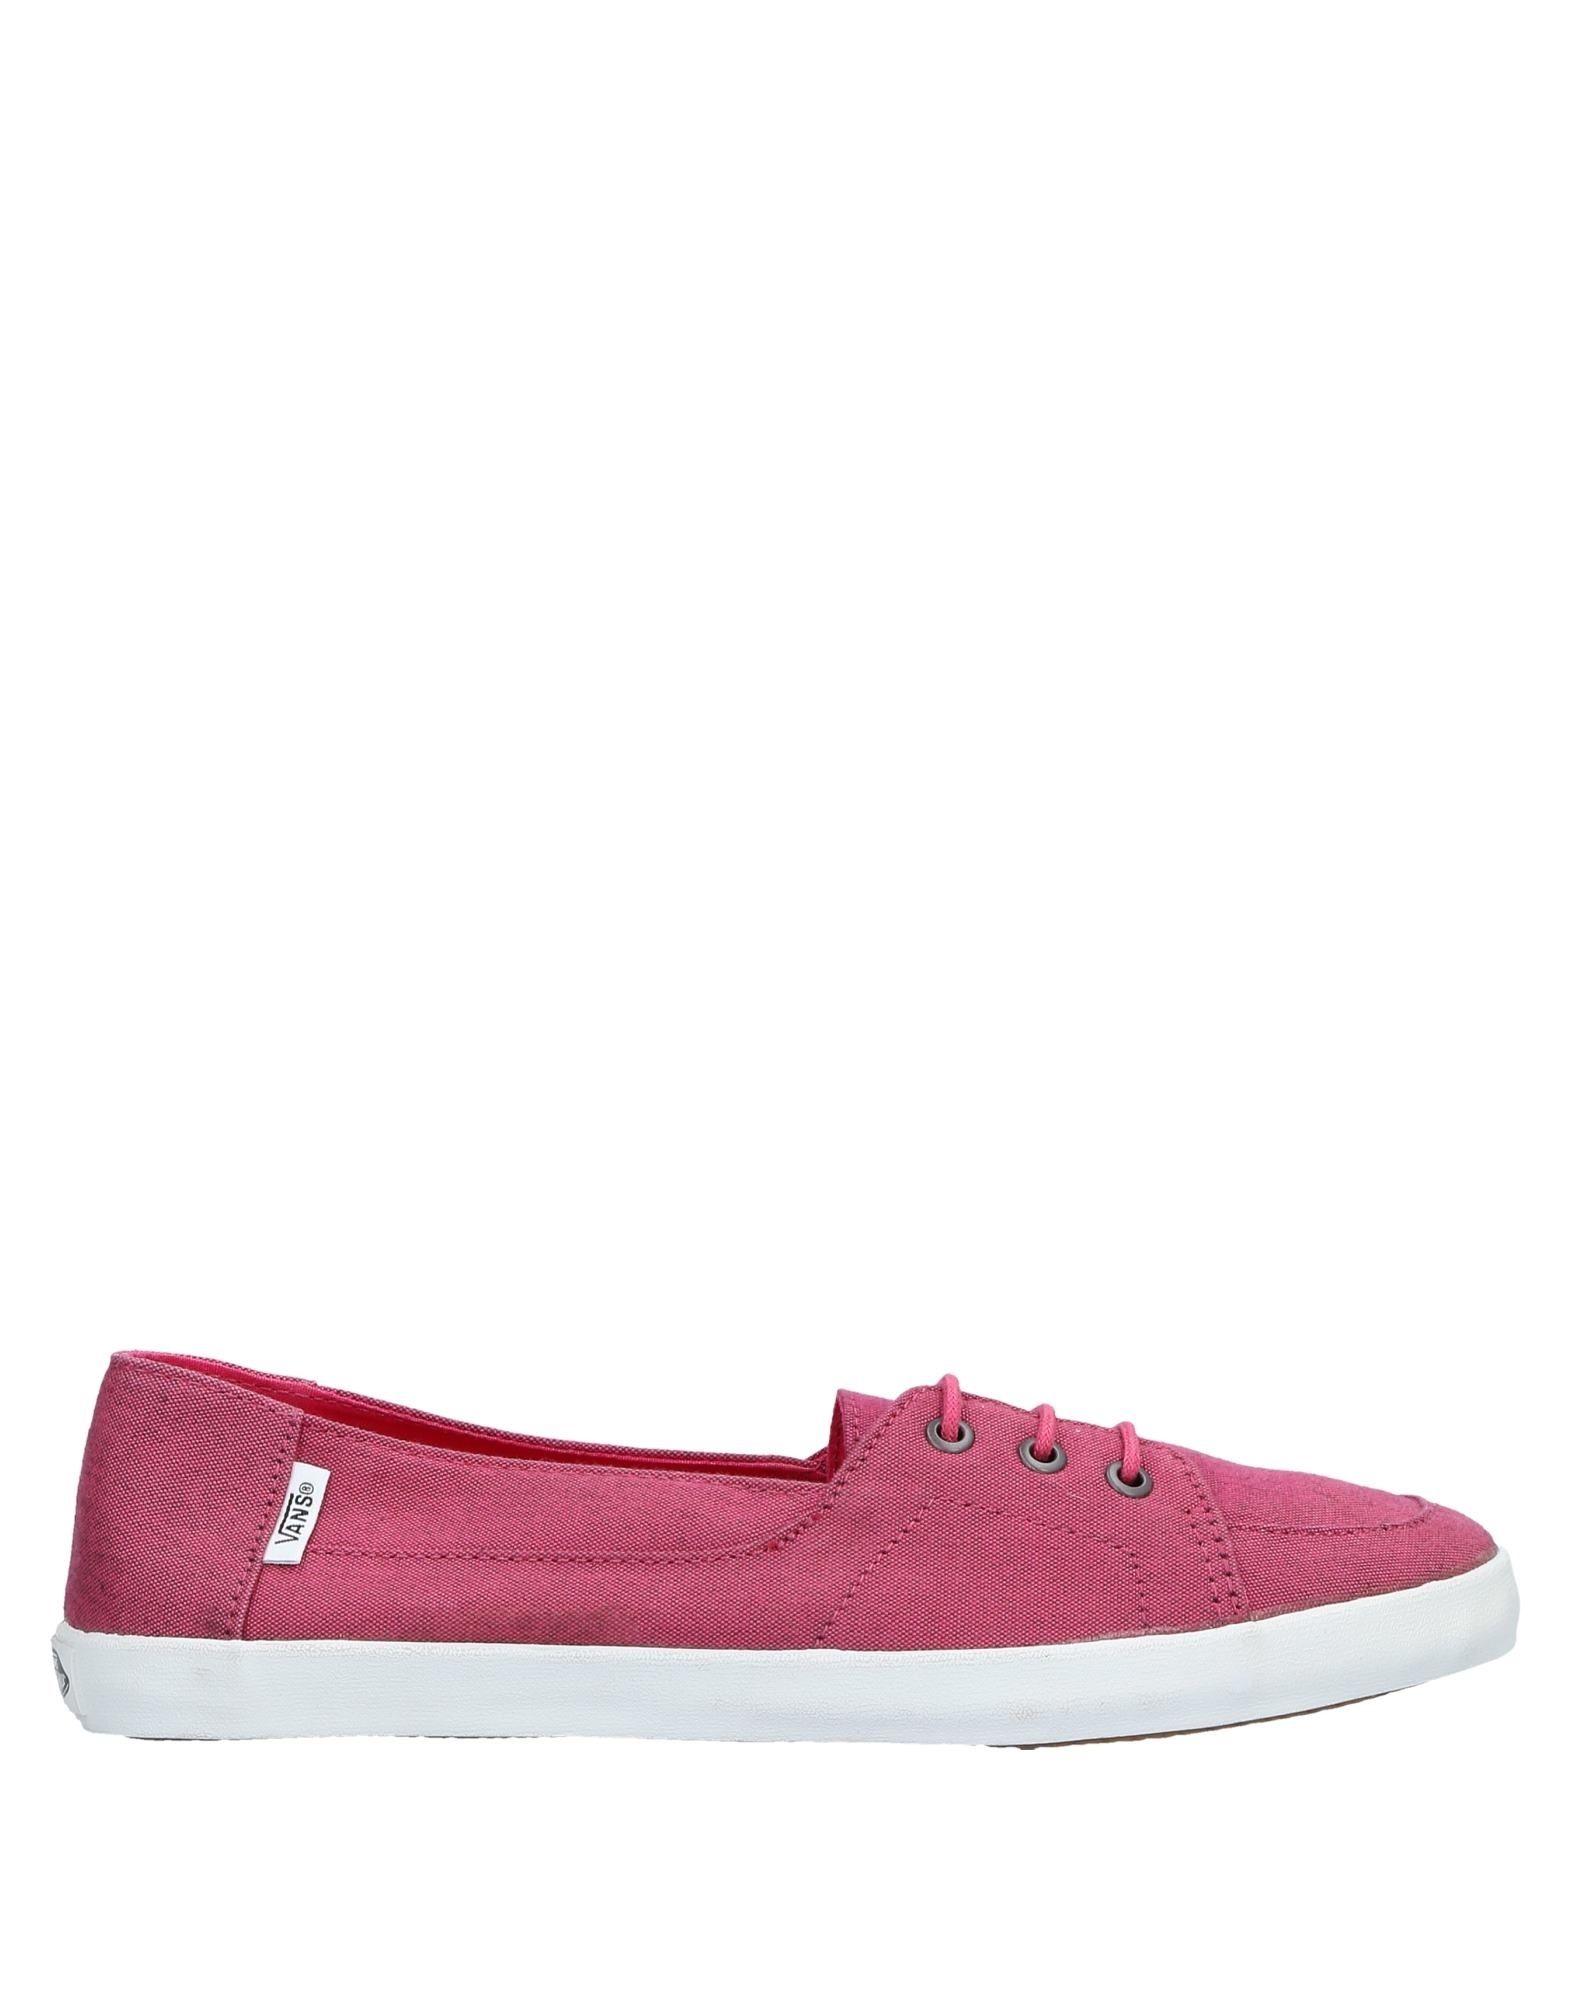 Sneakers Vans Scarpe Donna - 11519953UD Scarpe Vans comode e distintive 83bf97